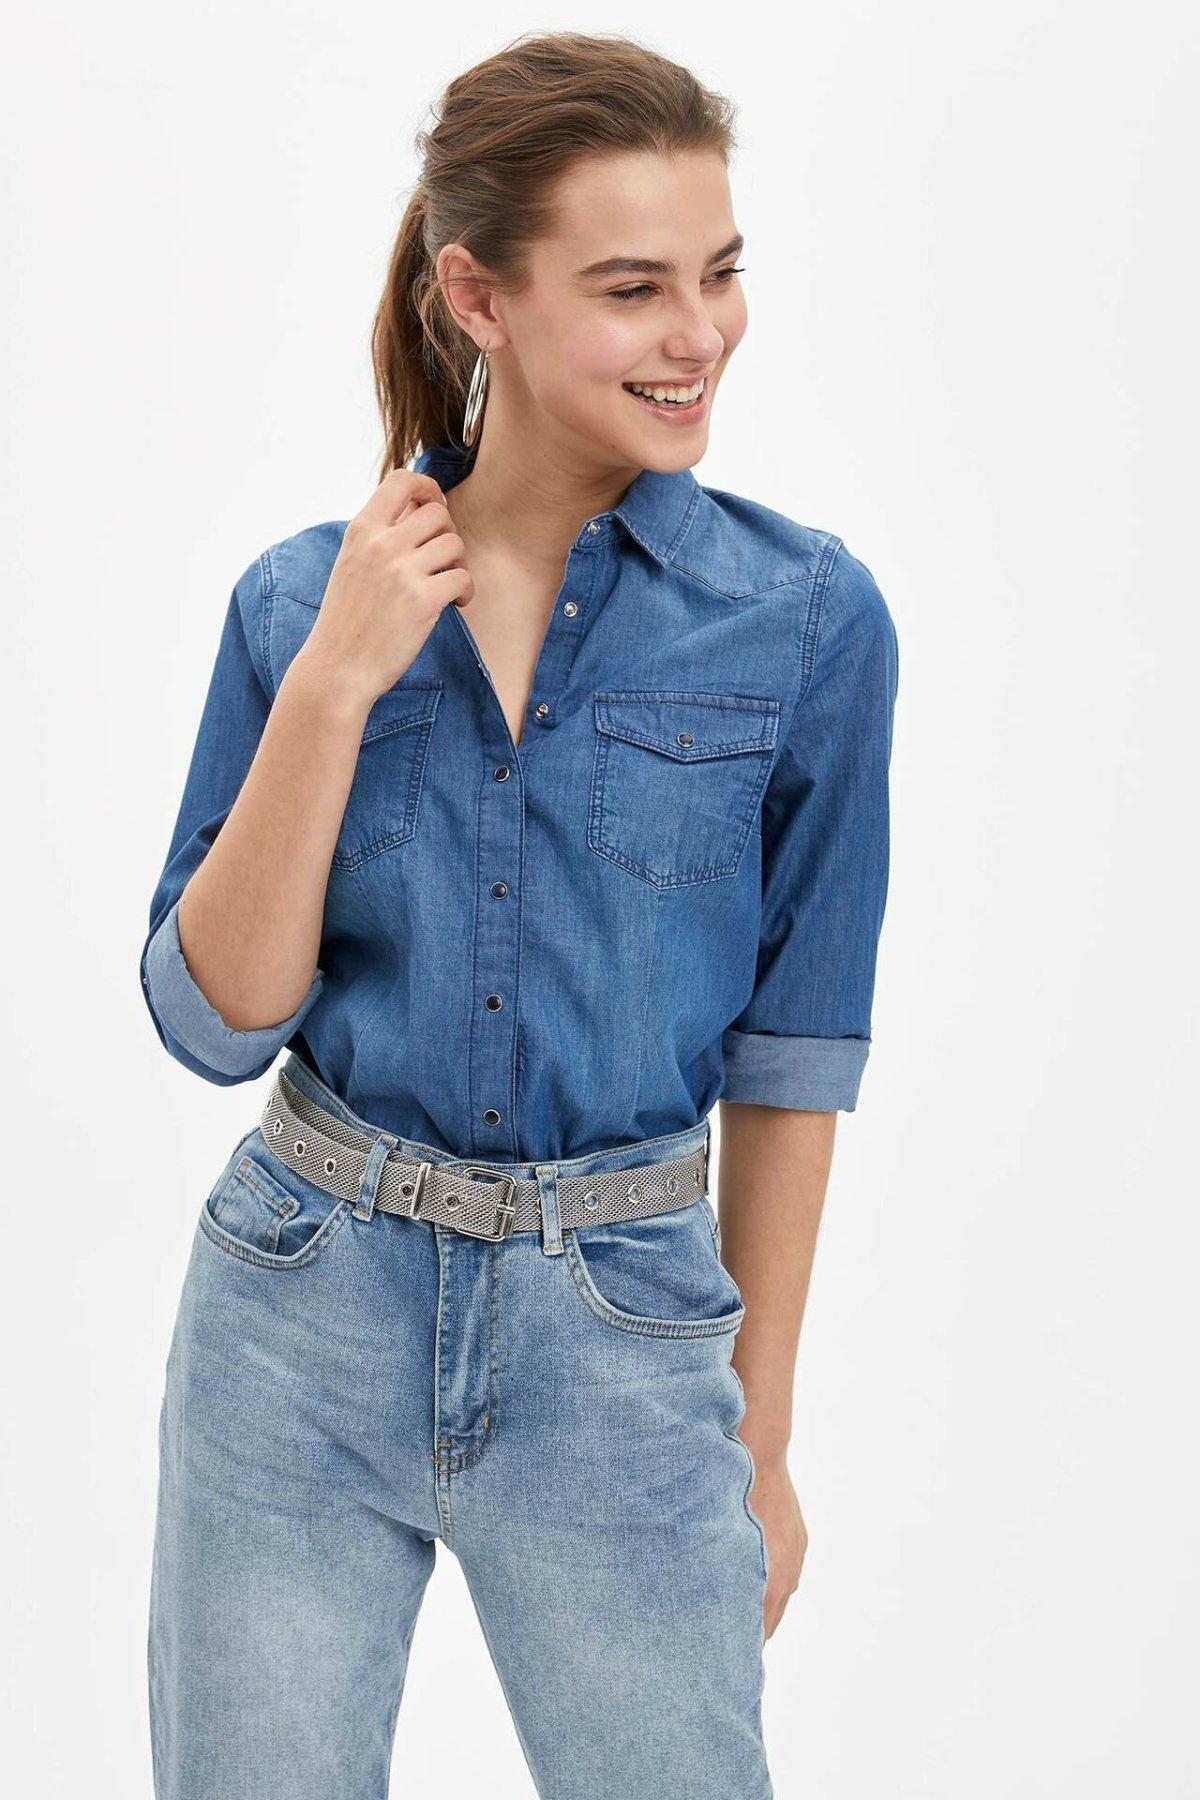 DeFacto Woman Spring Denim Shirt Women Casual Blue Shirt Women Stylish All-match Denim Shirts-L3567AZ20SP